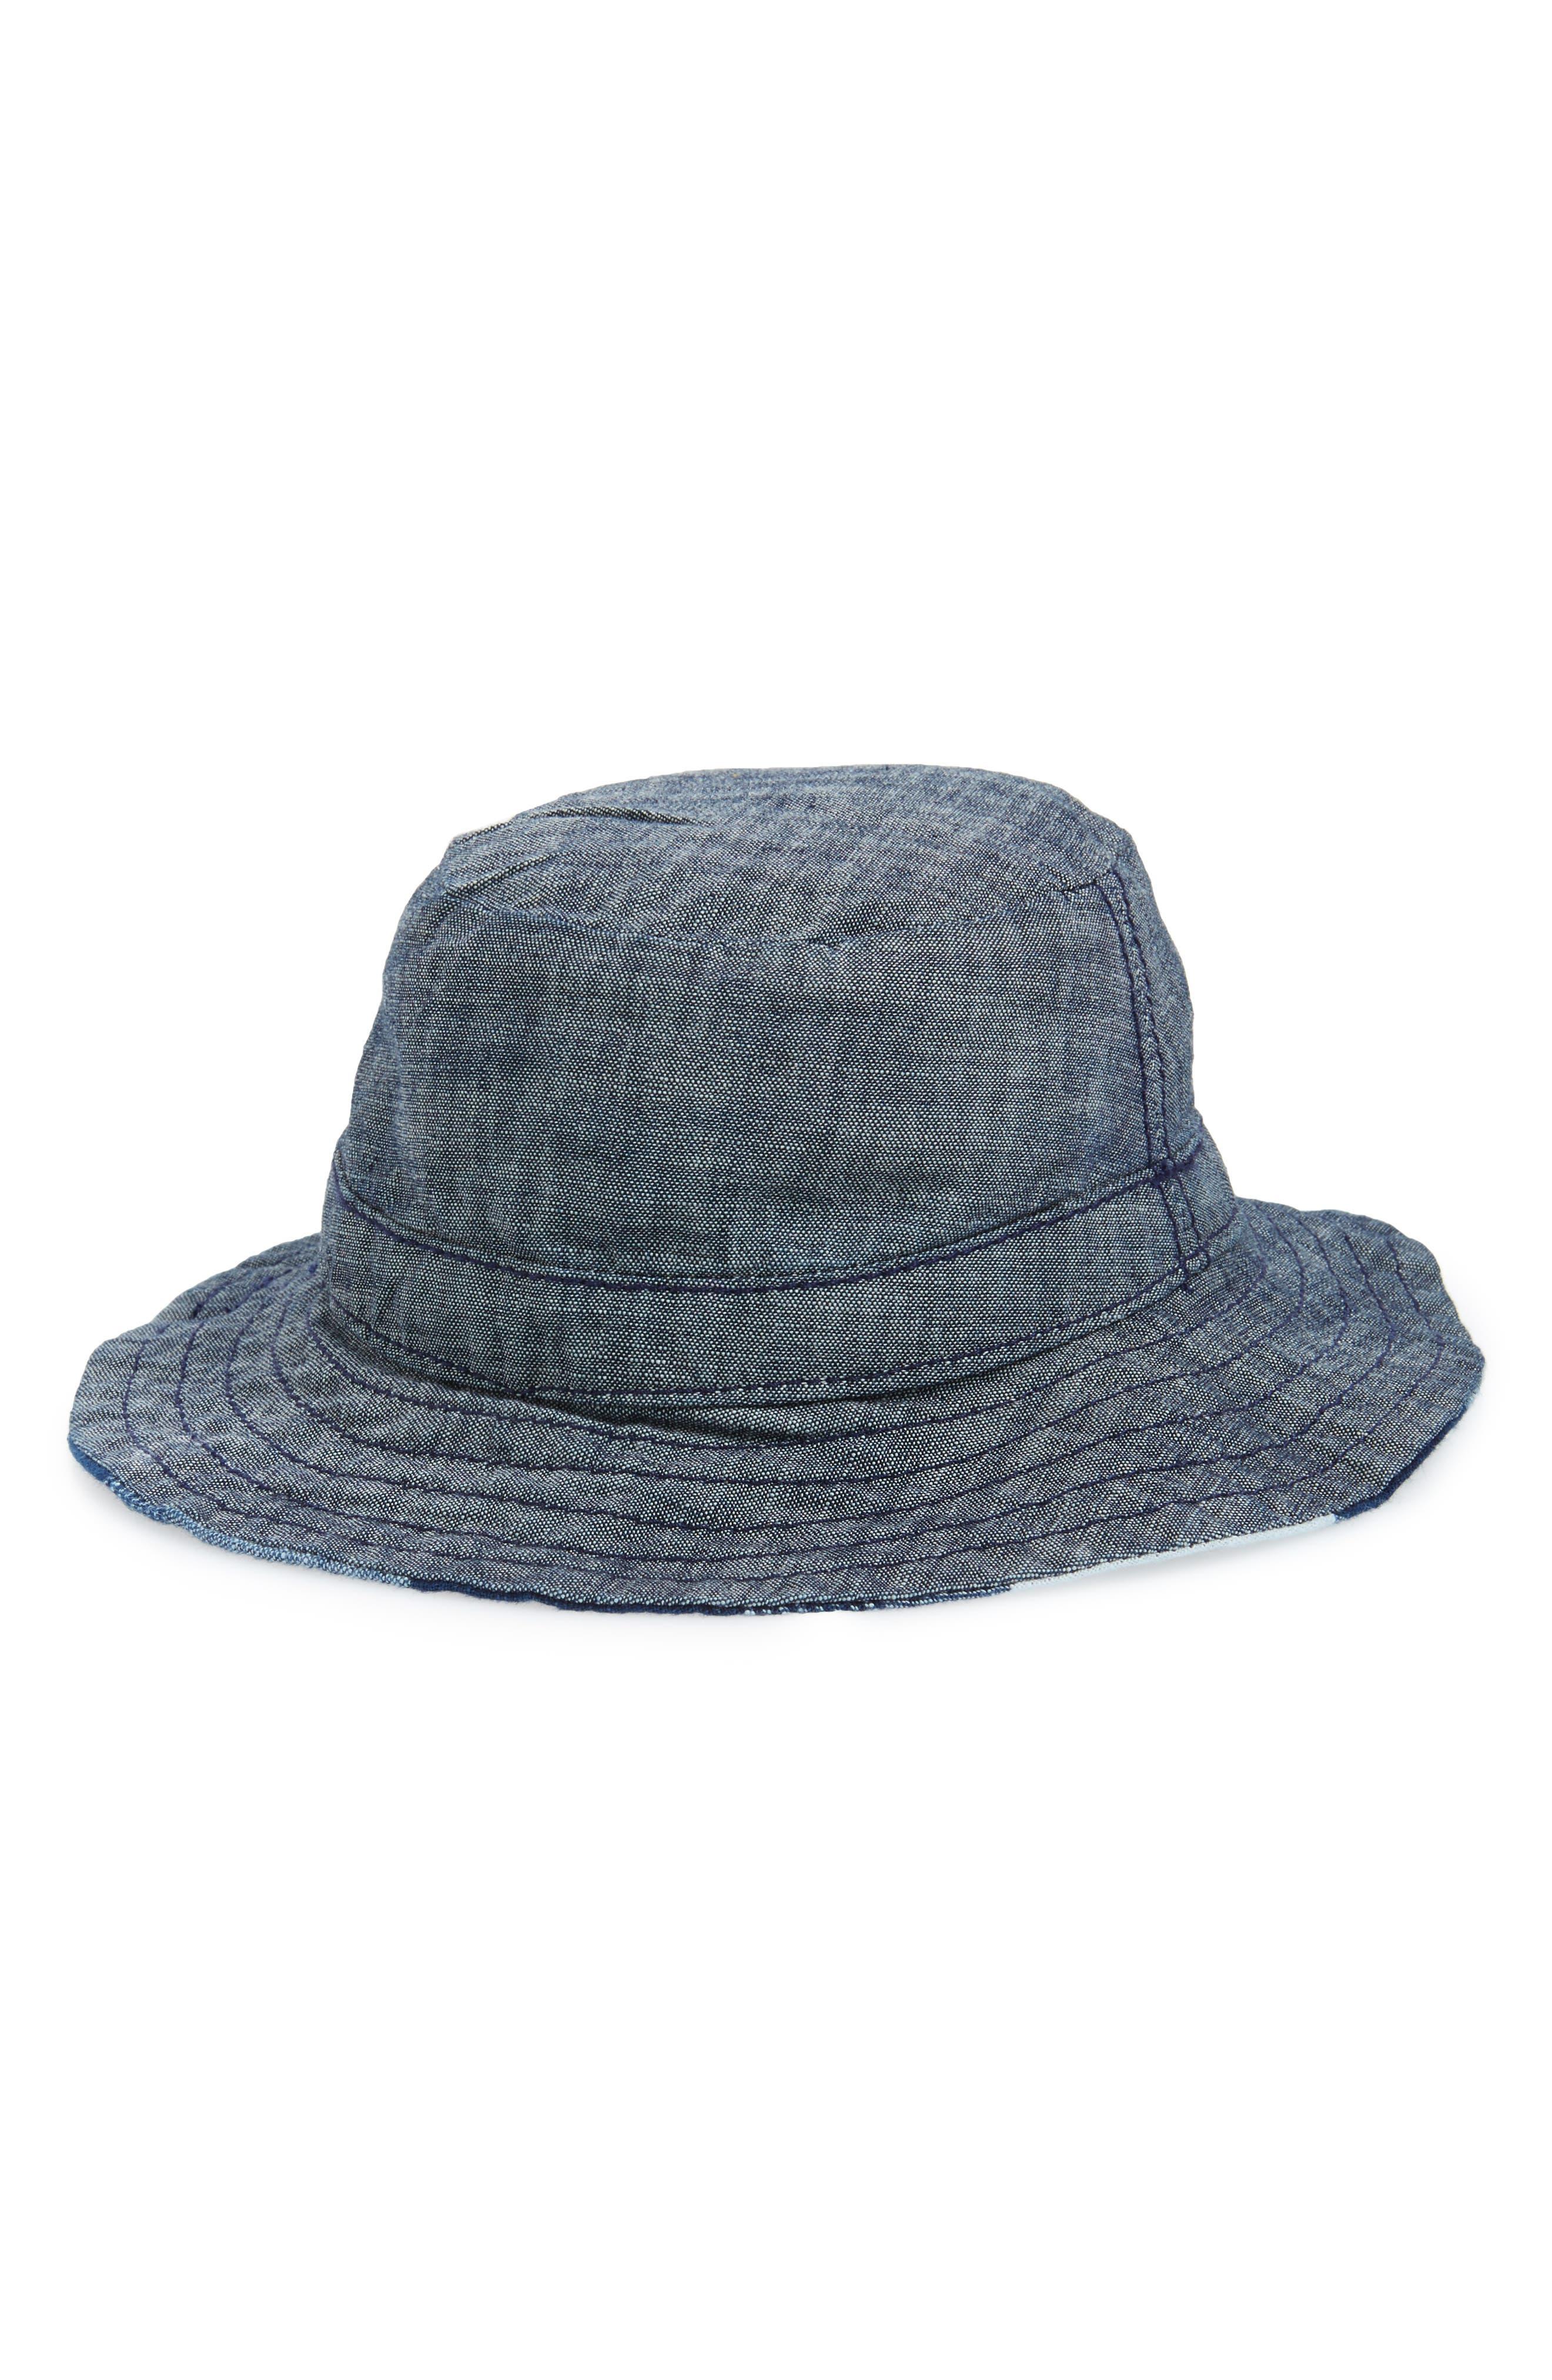 Reversible Bucket Hat,                             Alternate thumbnail 2, color,                             401